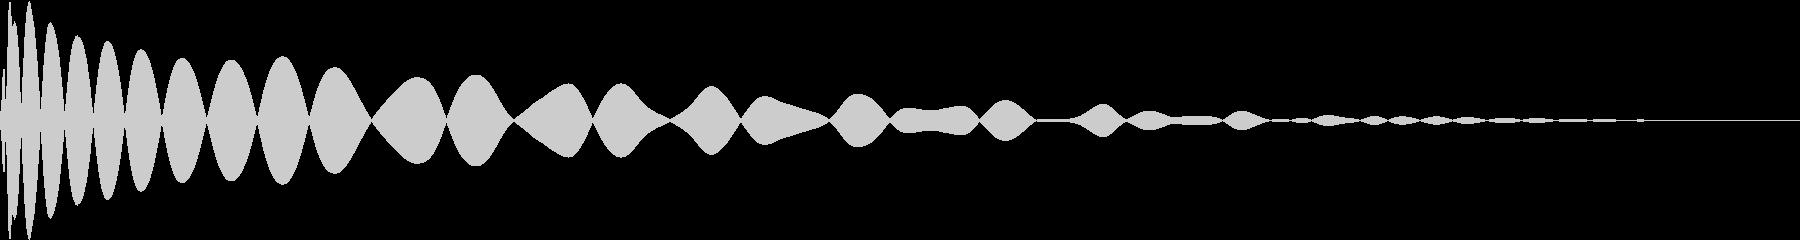 DTM Kick 100 オリジナル音源の未再生の波形